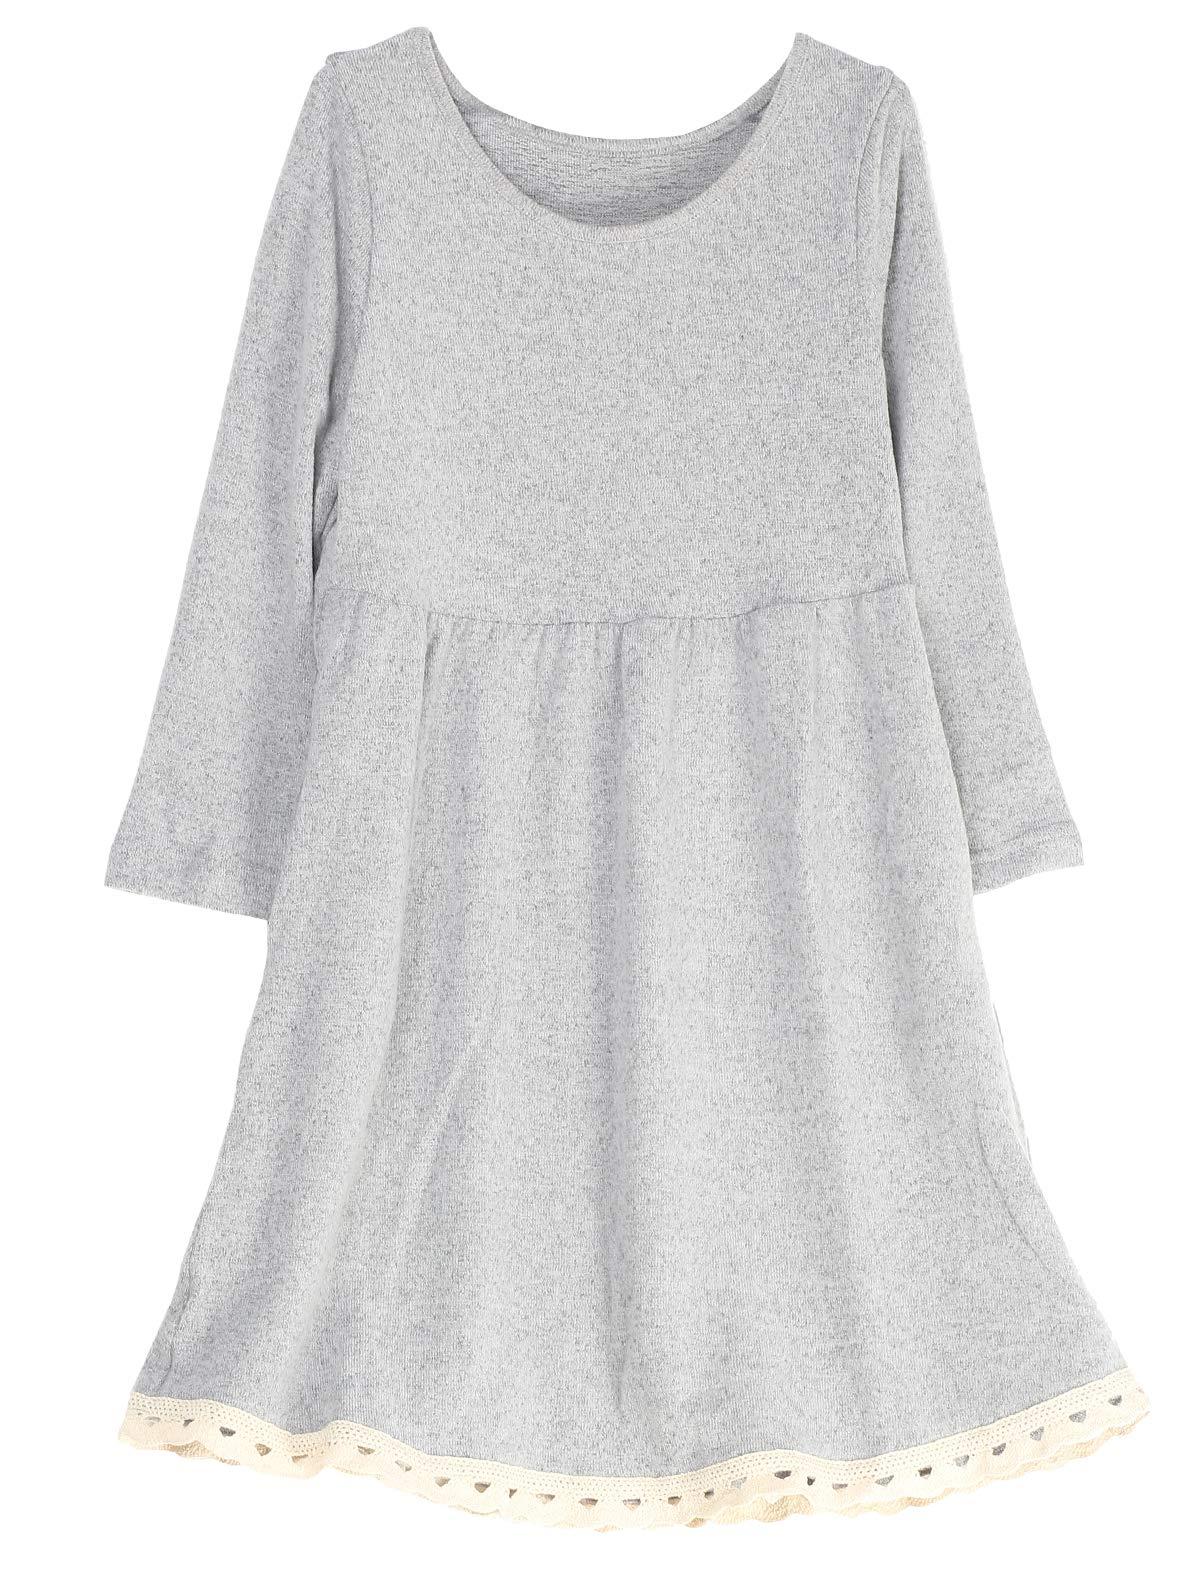 Mallimoda Big Girl's Casual Long Sleeve Knit Dress with Lace Hem Gray 9-10 Years